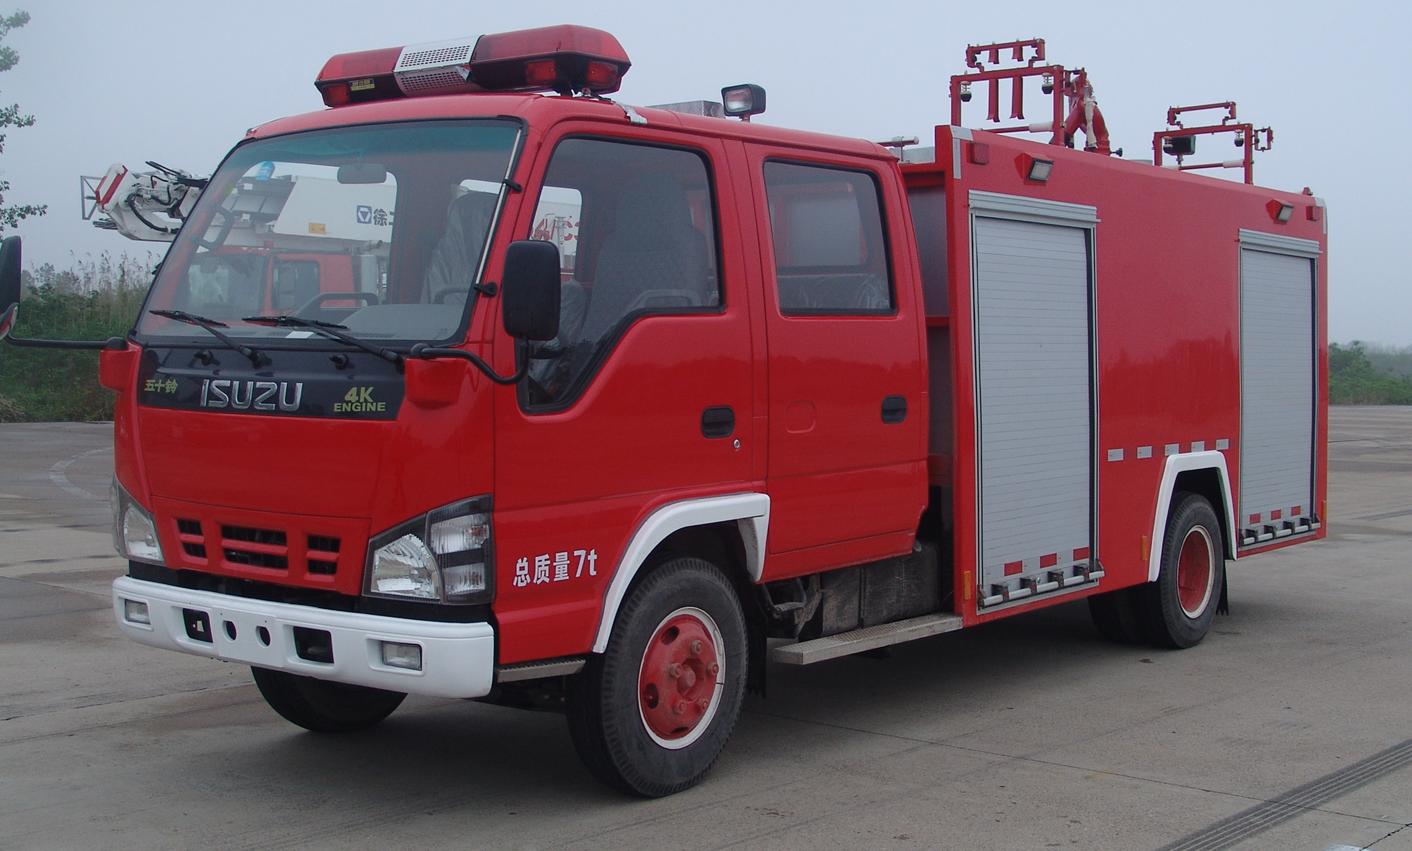 Fire Engine Fire Fighting Truck Firefighting